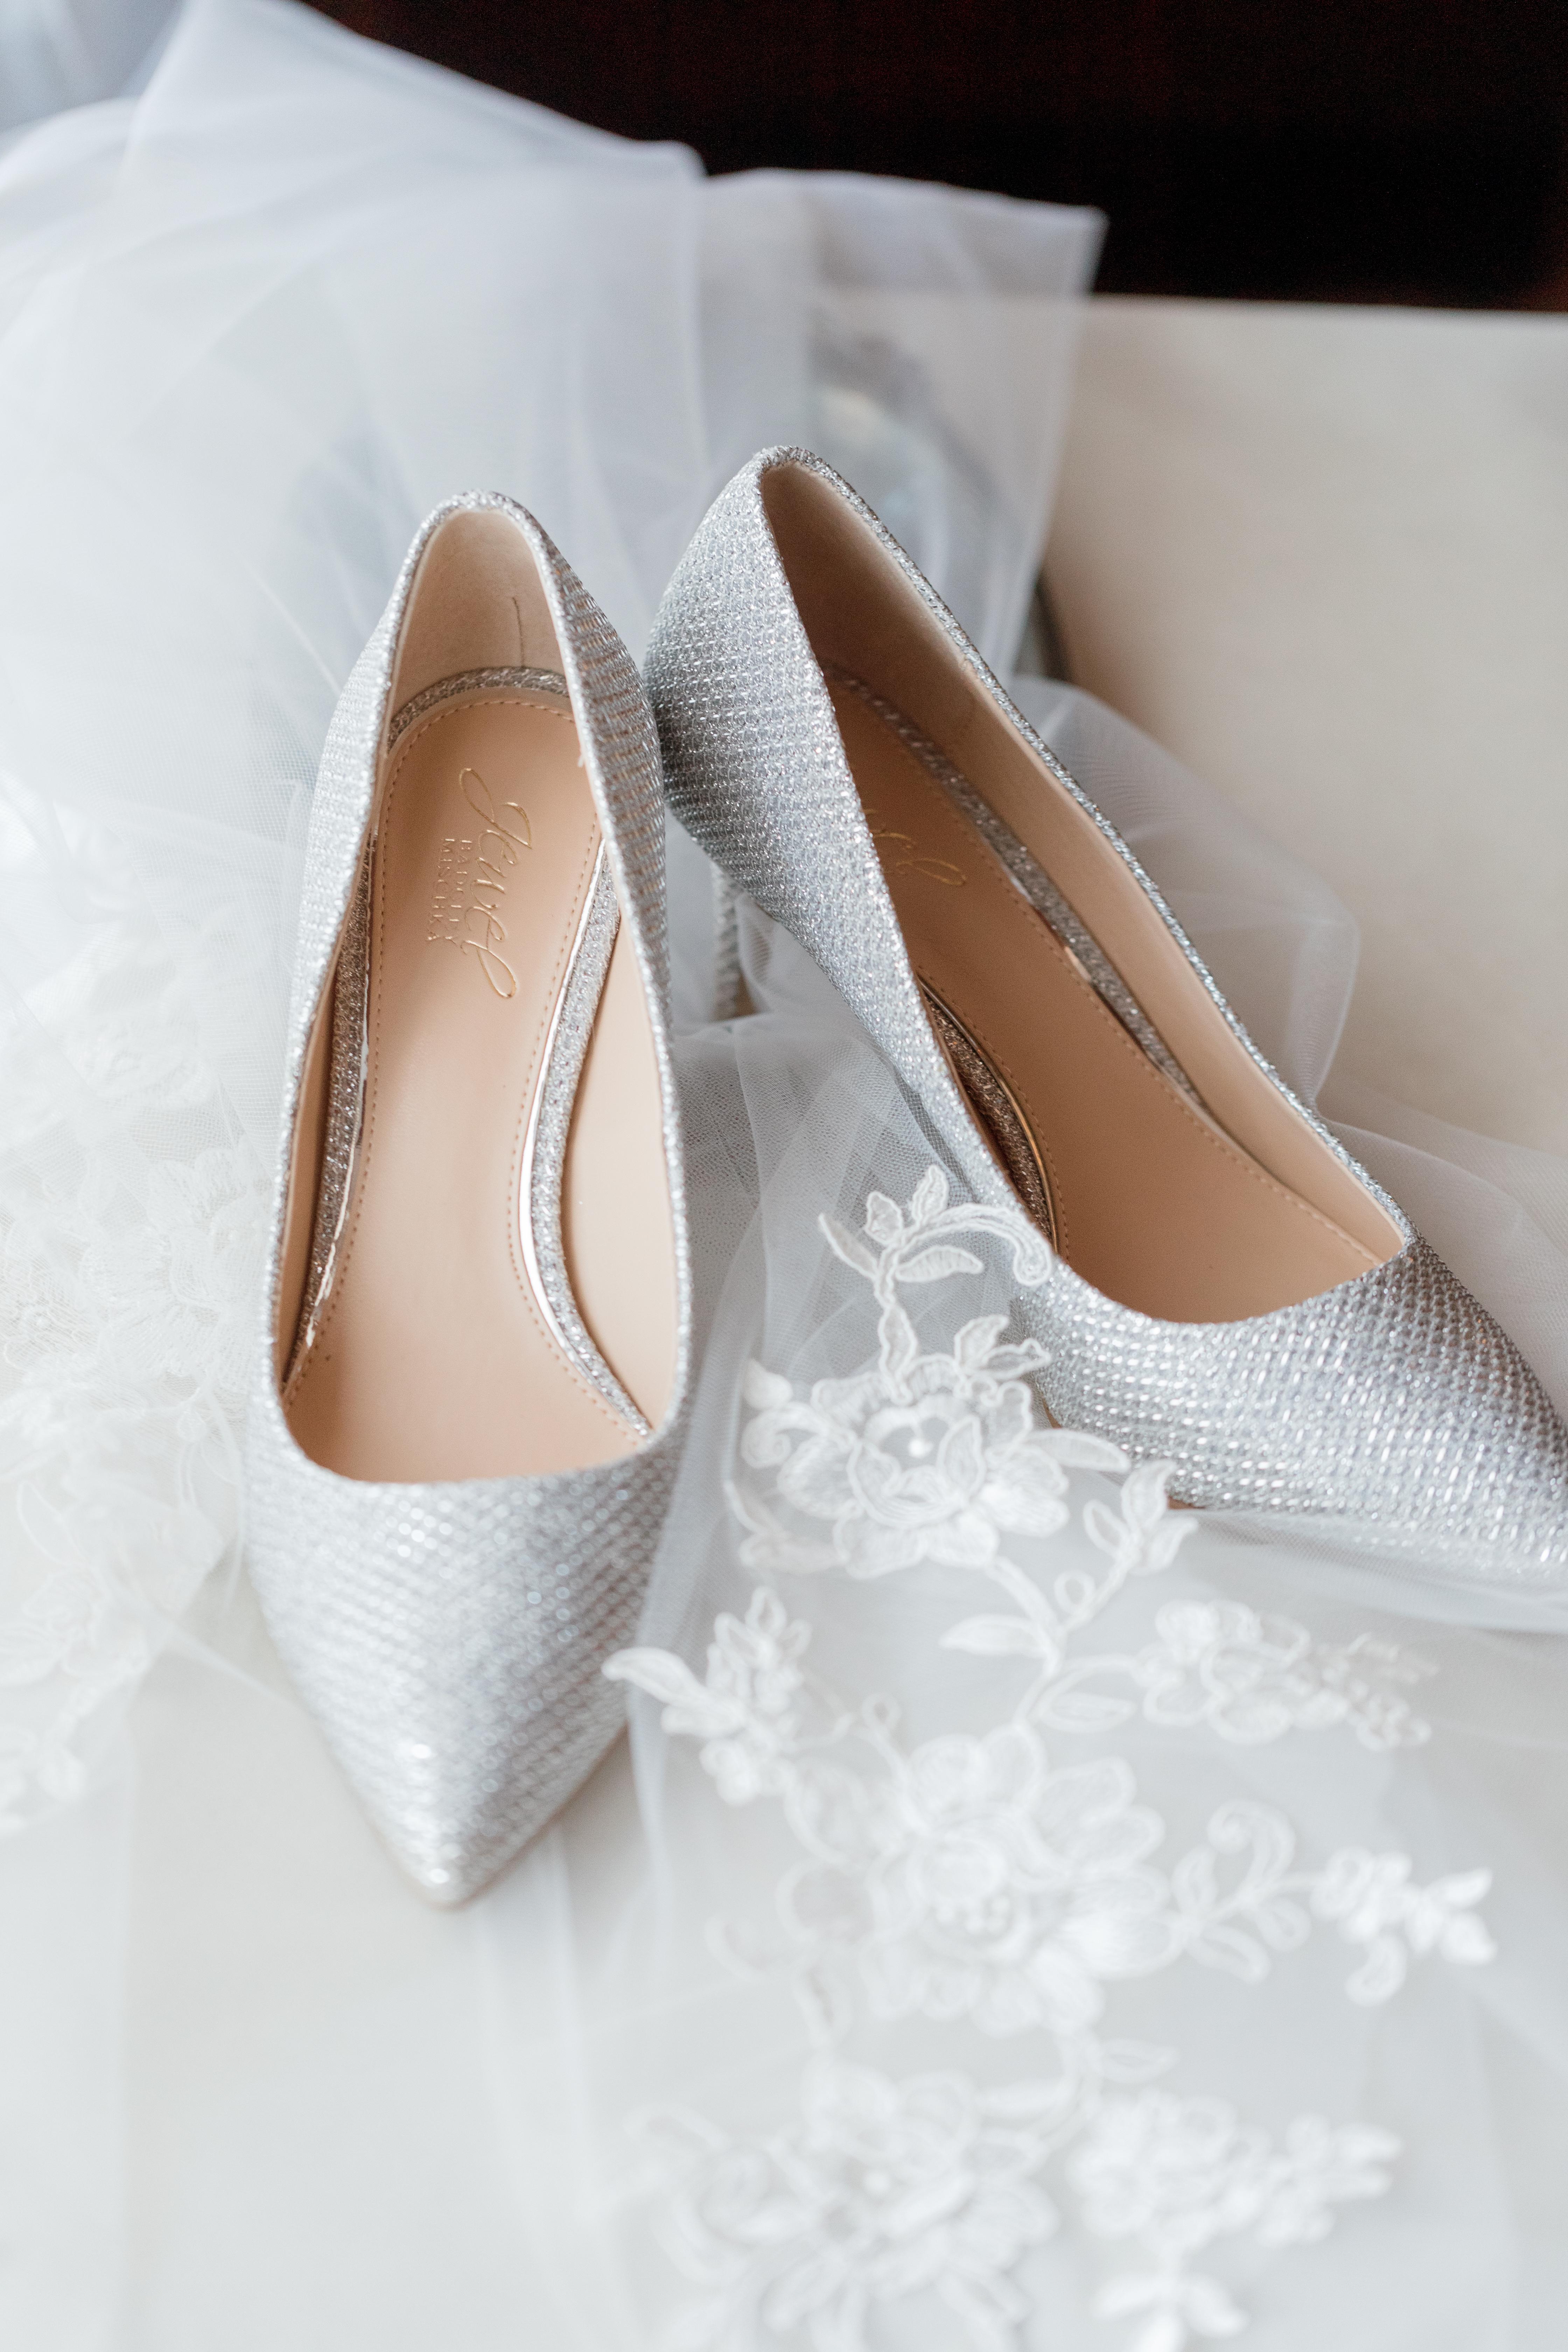 Ritz-Carlton-Bachelor-Gulch-Beaver-Creek-Colorado-Fall-Wedding-Bride-Heels